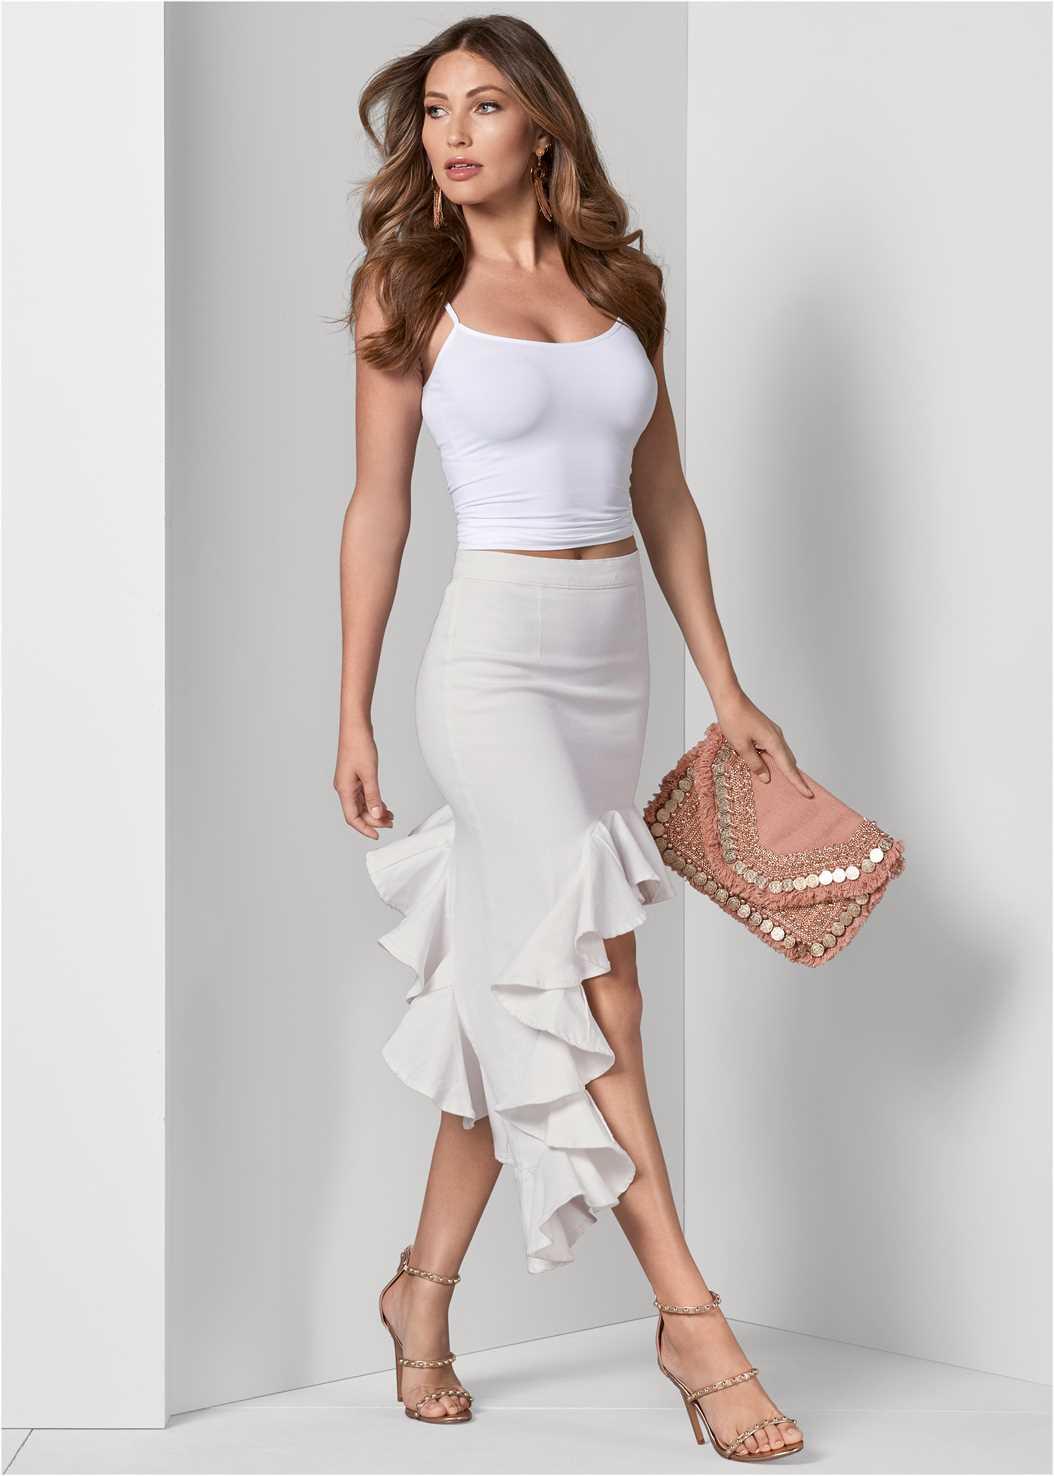 Ruffle Jean Skirt,Basic Cami Two Pack